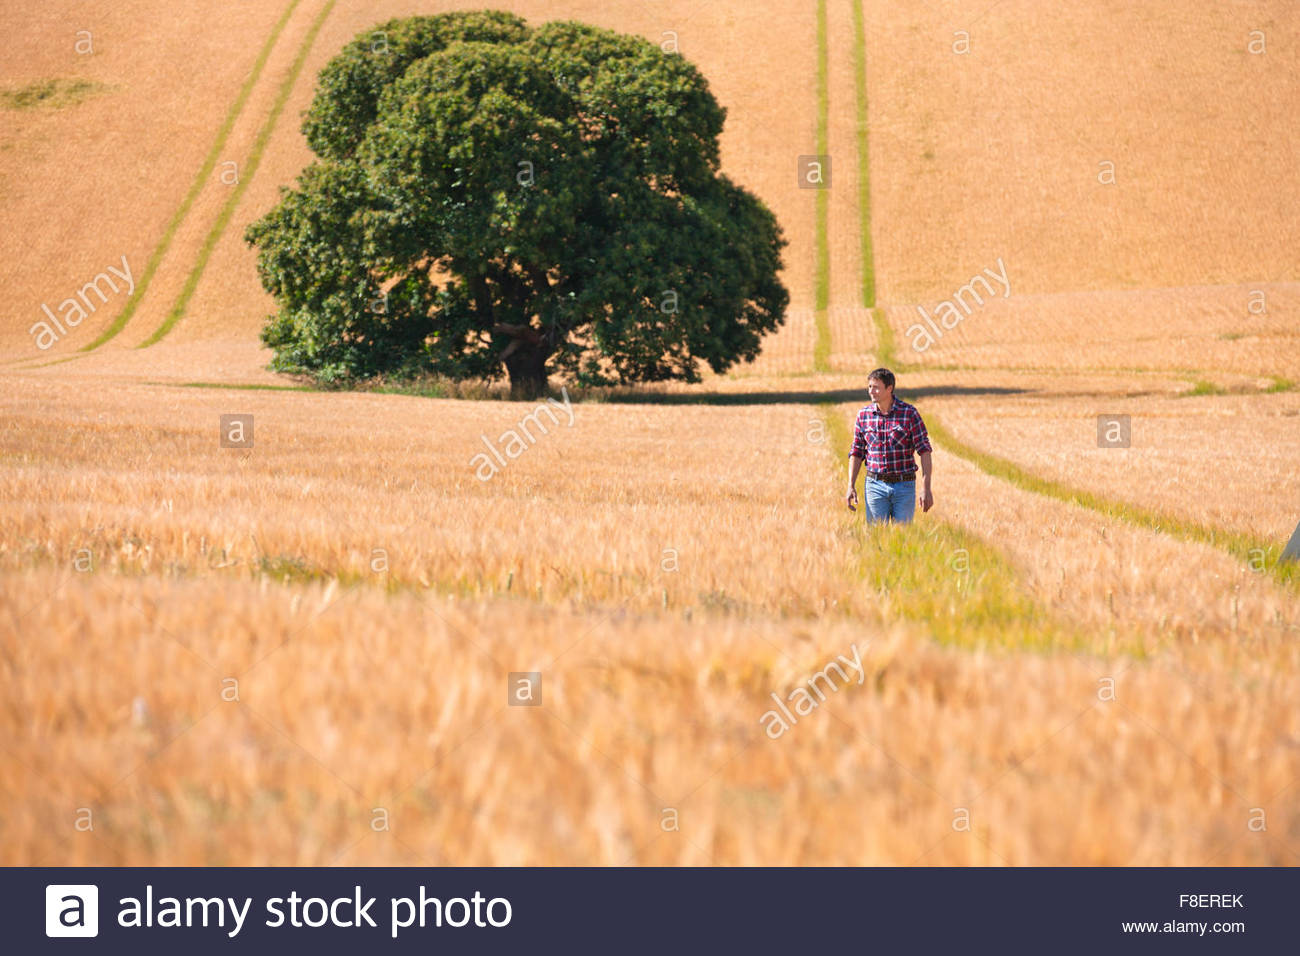 Farmer walking in sunny rural barley crop field in summer - Stock Image